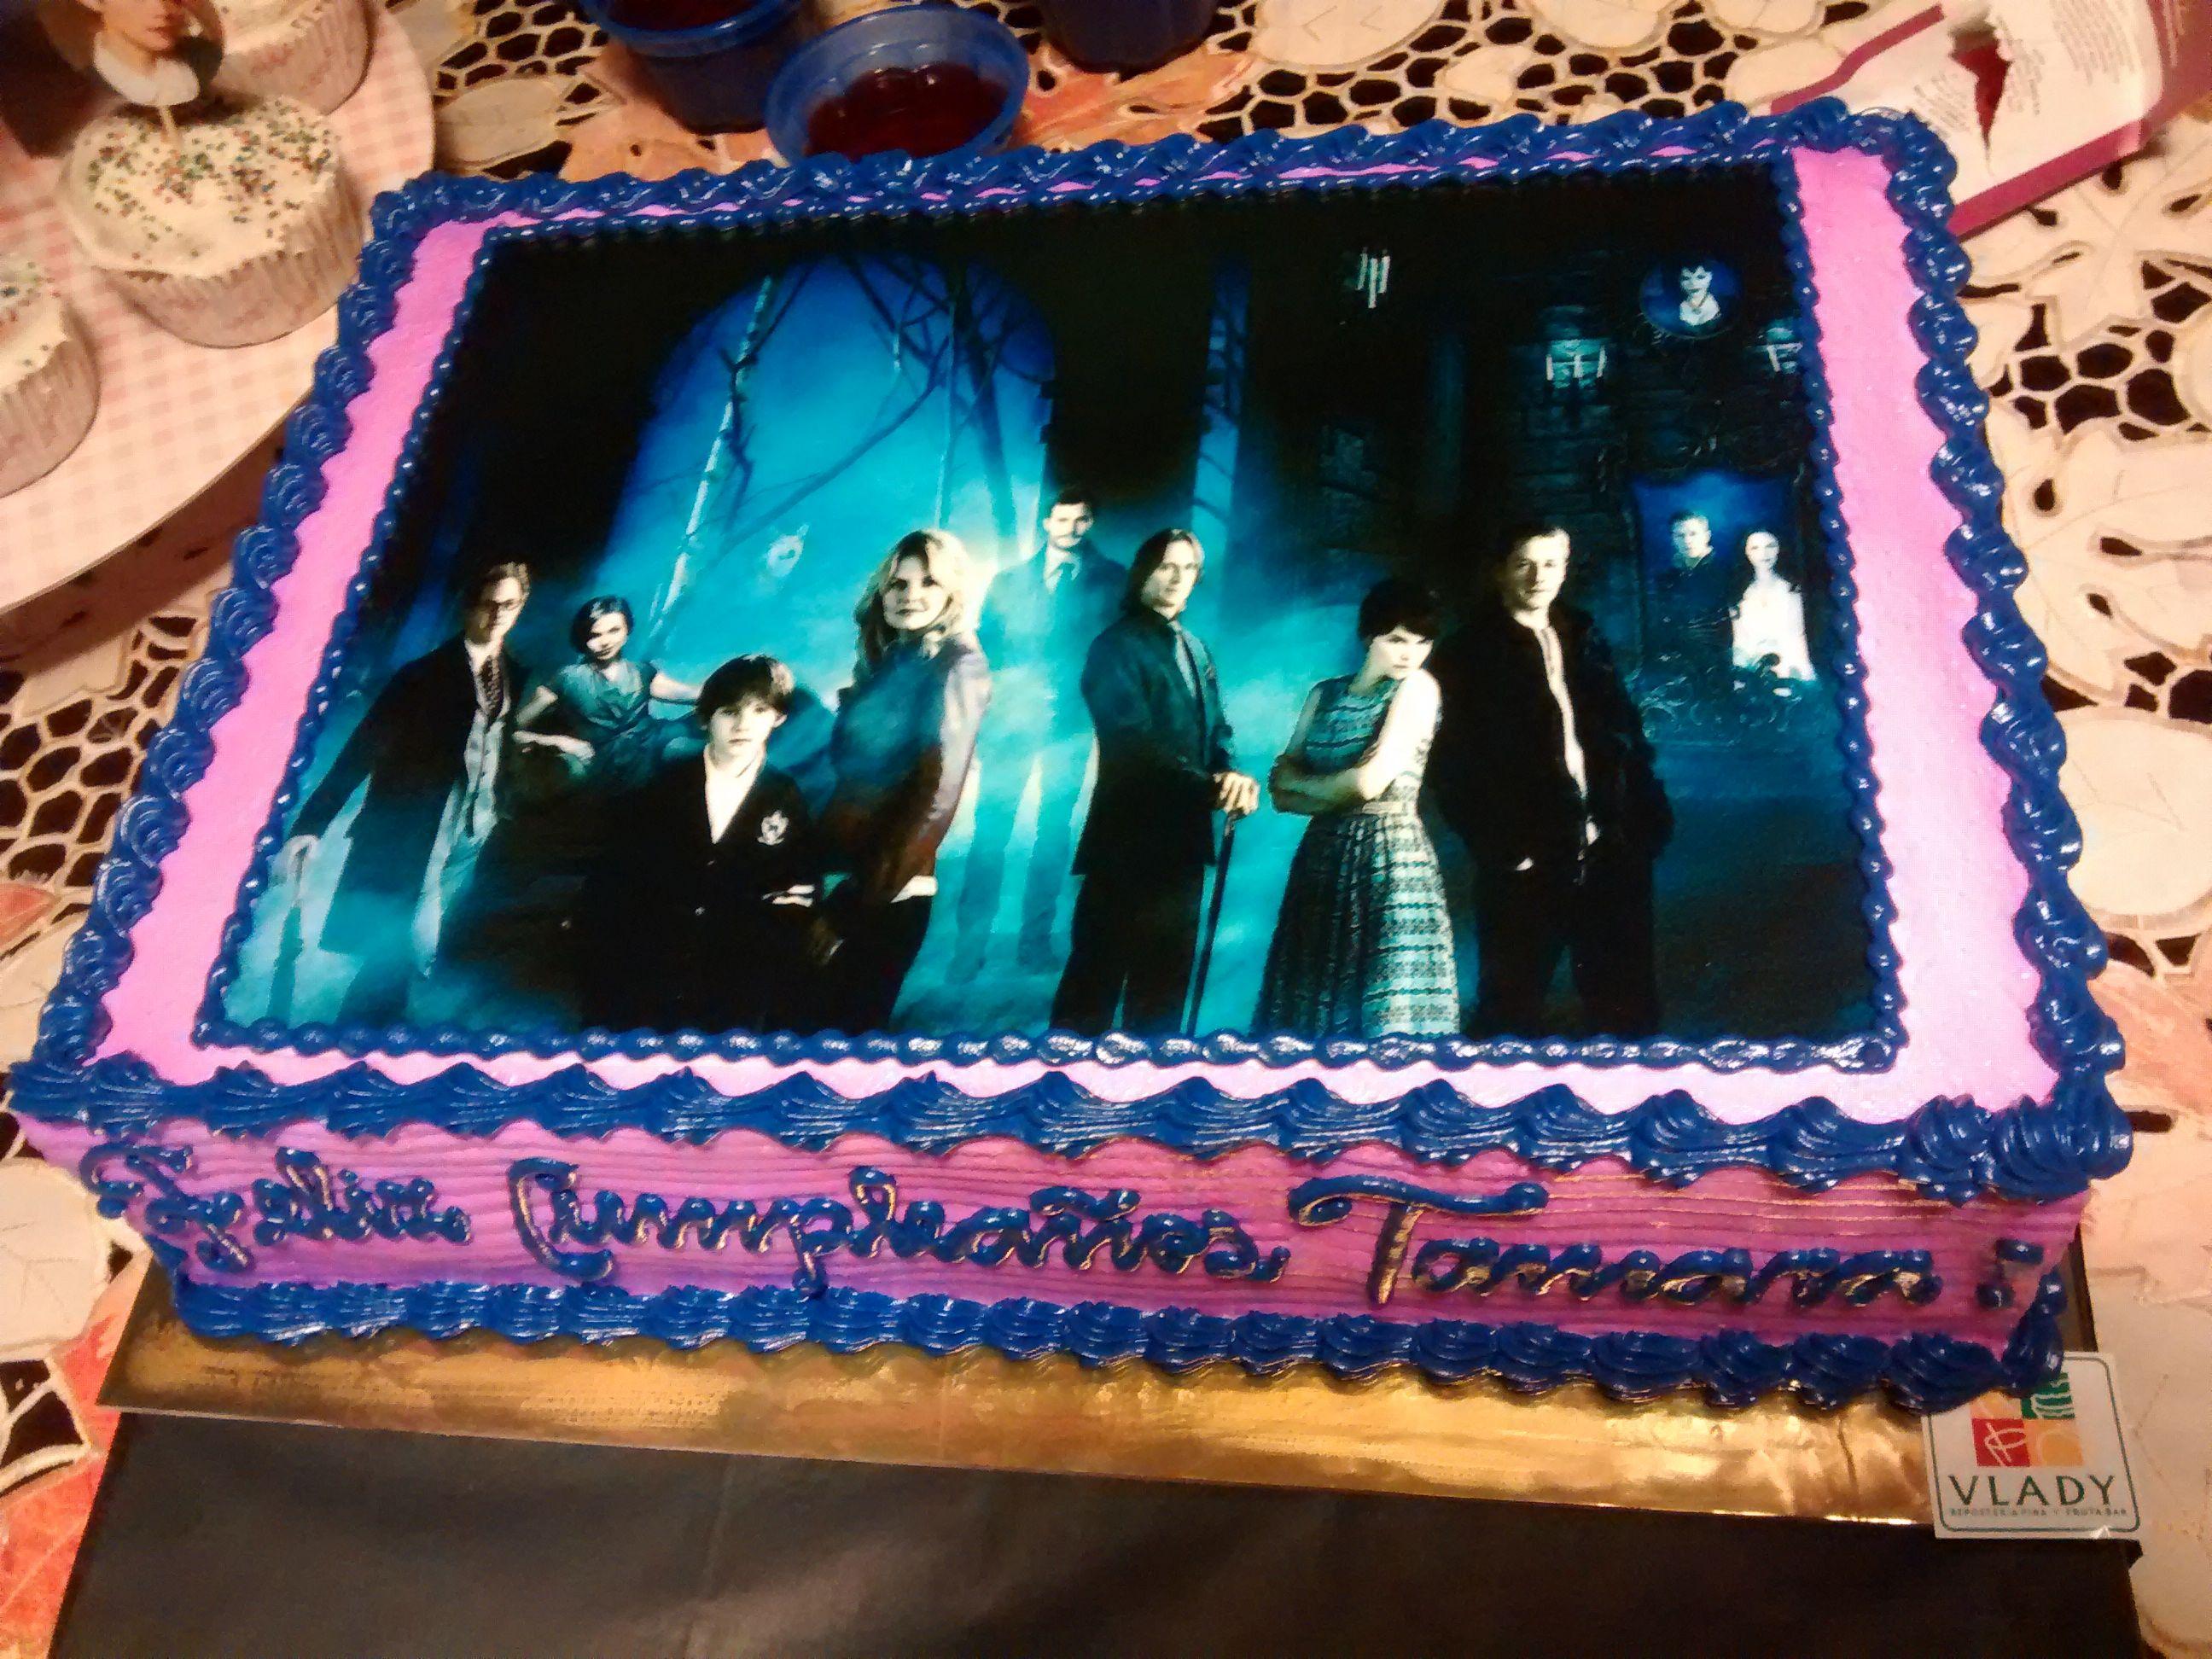 Torta de 20x30 cm con foto impresa comestible